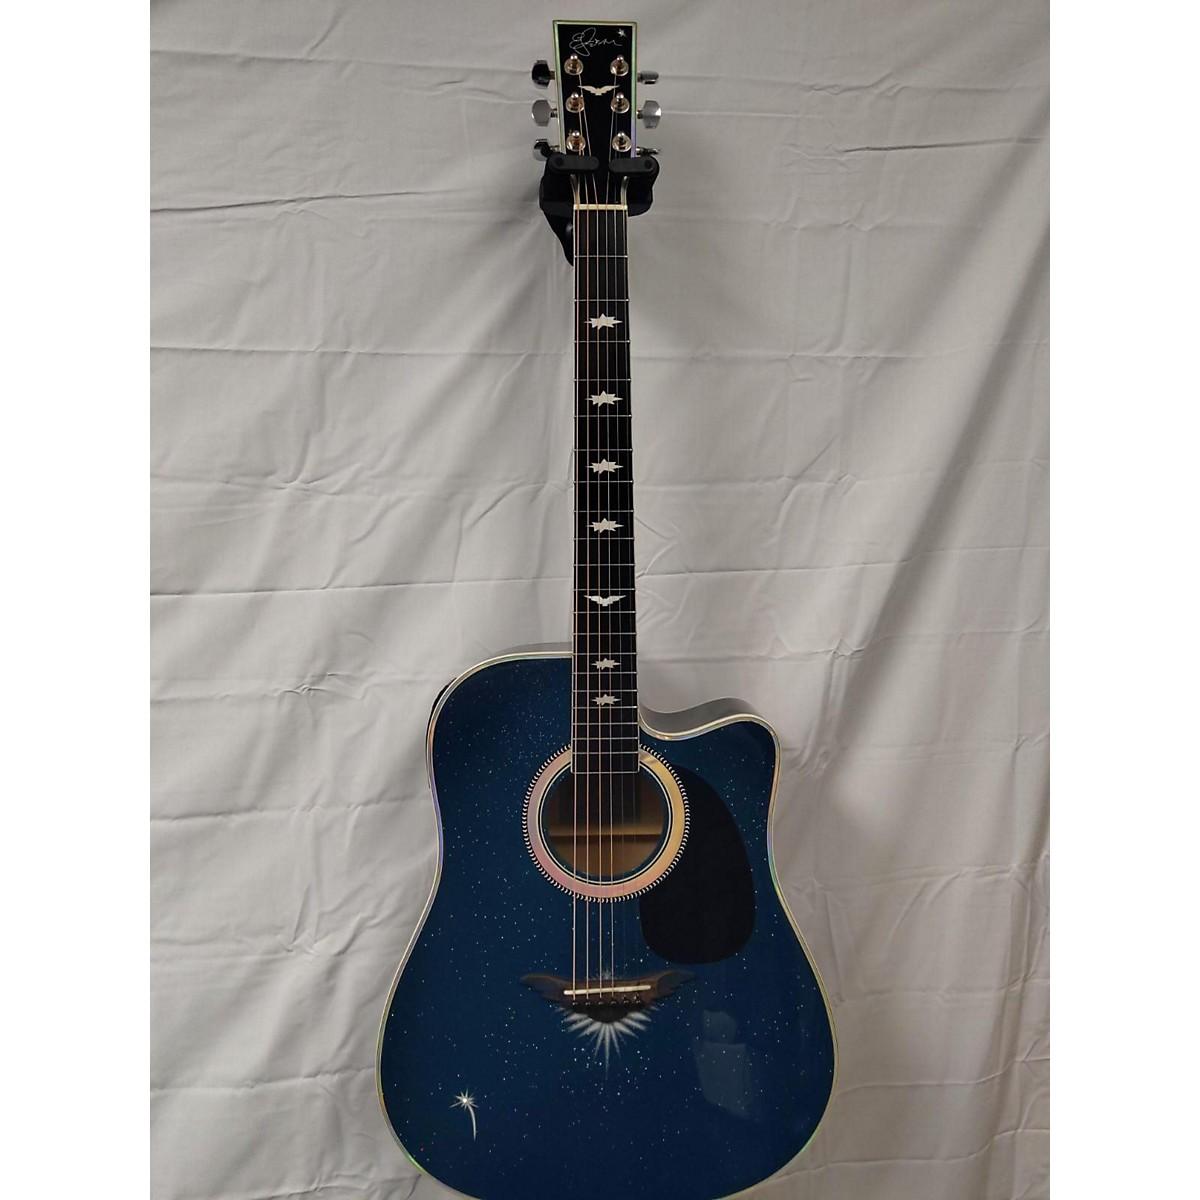 Esteban Starlight Acoustic Electric Guitar